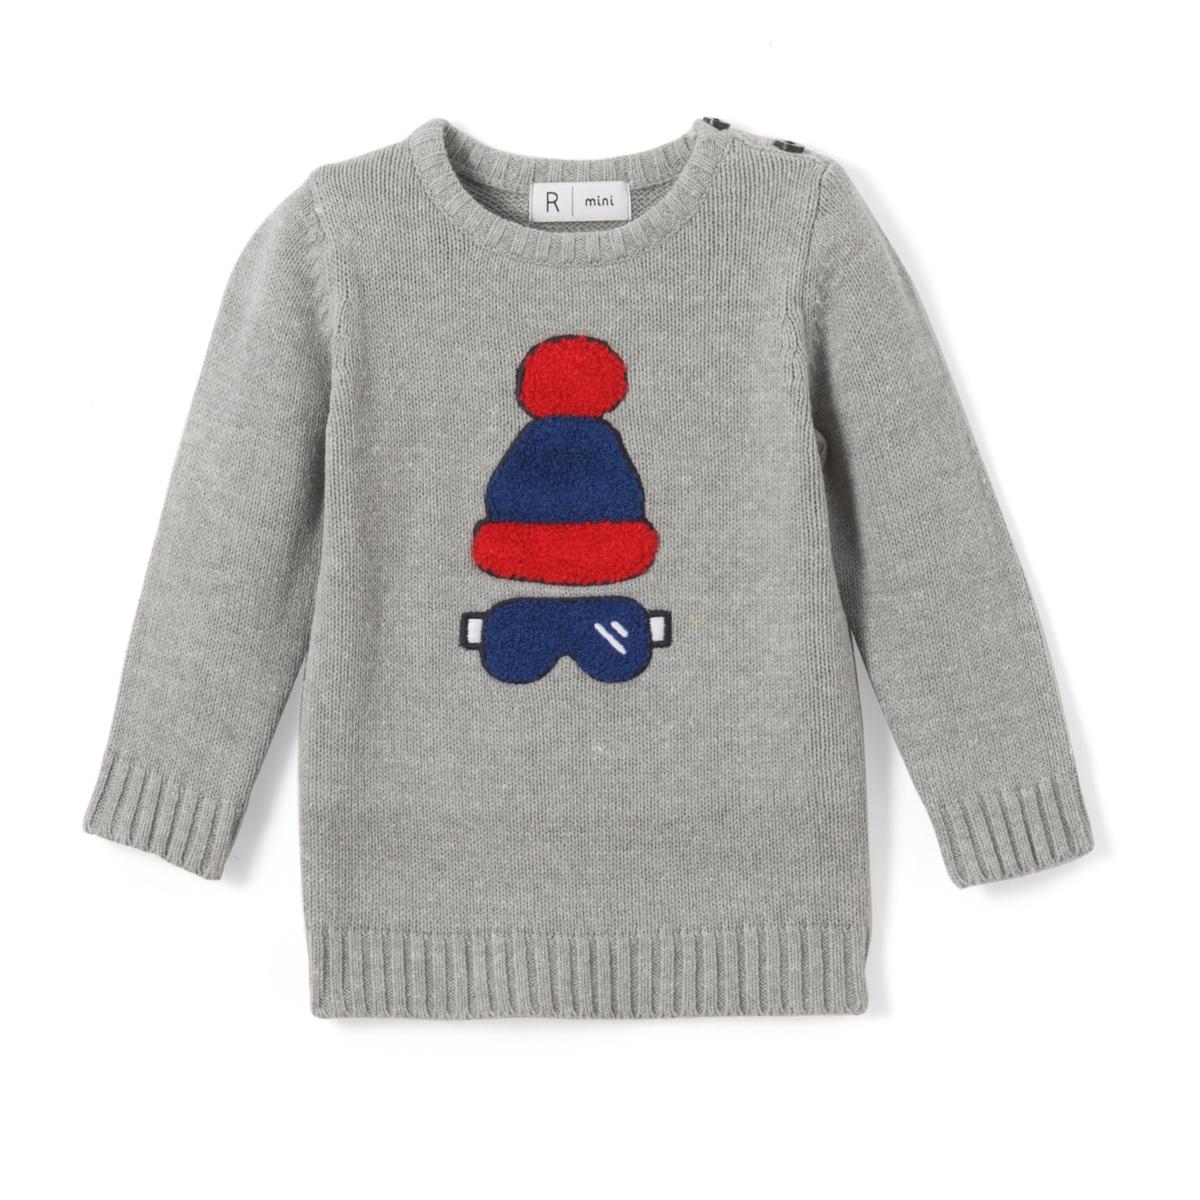 Пуловер с рисунком интарсия ML, 1 мес.-3 лет